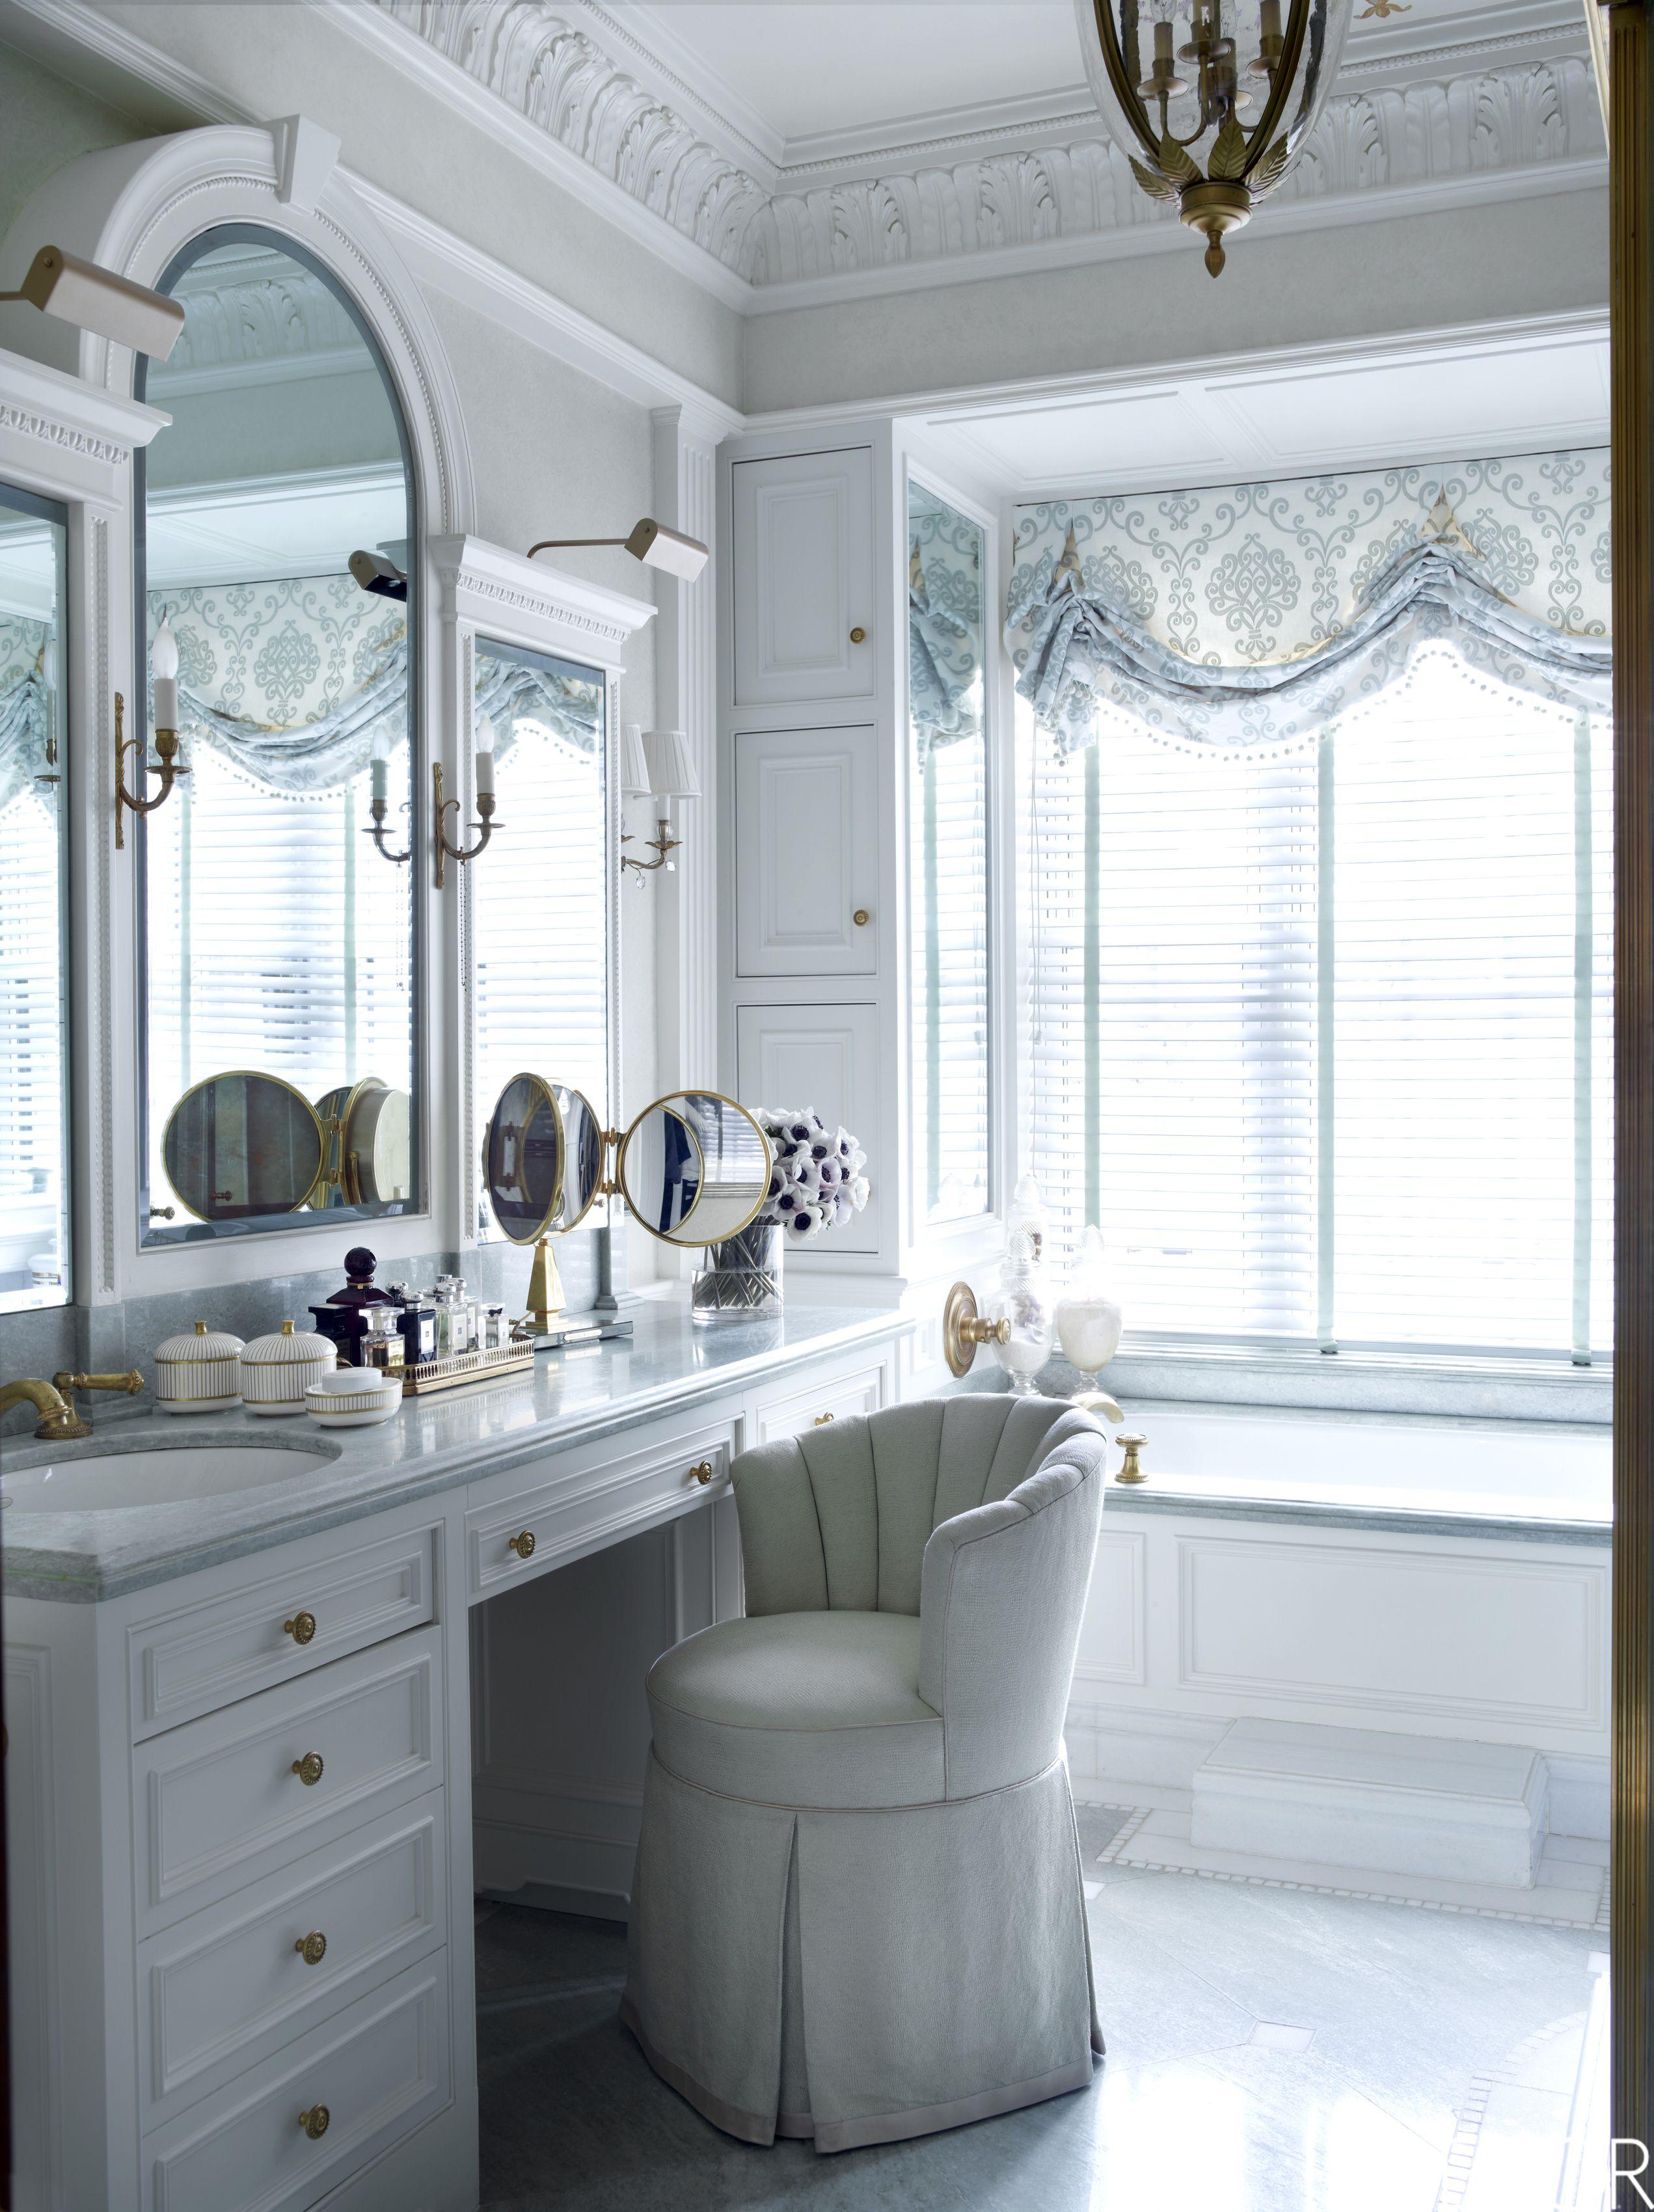 20 Best Bathroom Decor Ideas And Luxury Bathrooms - Bathroom Design